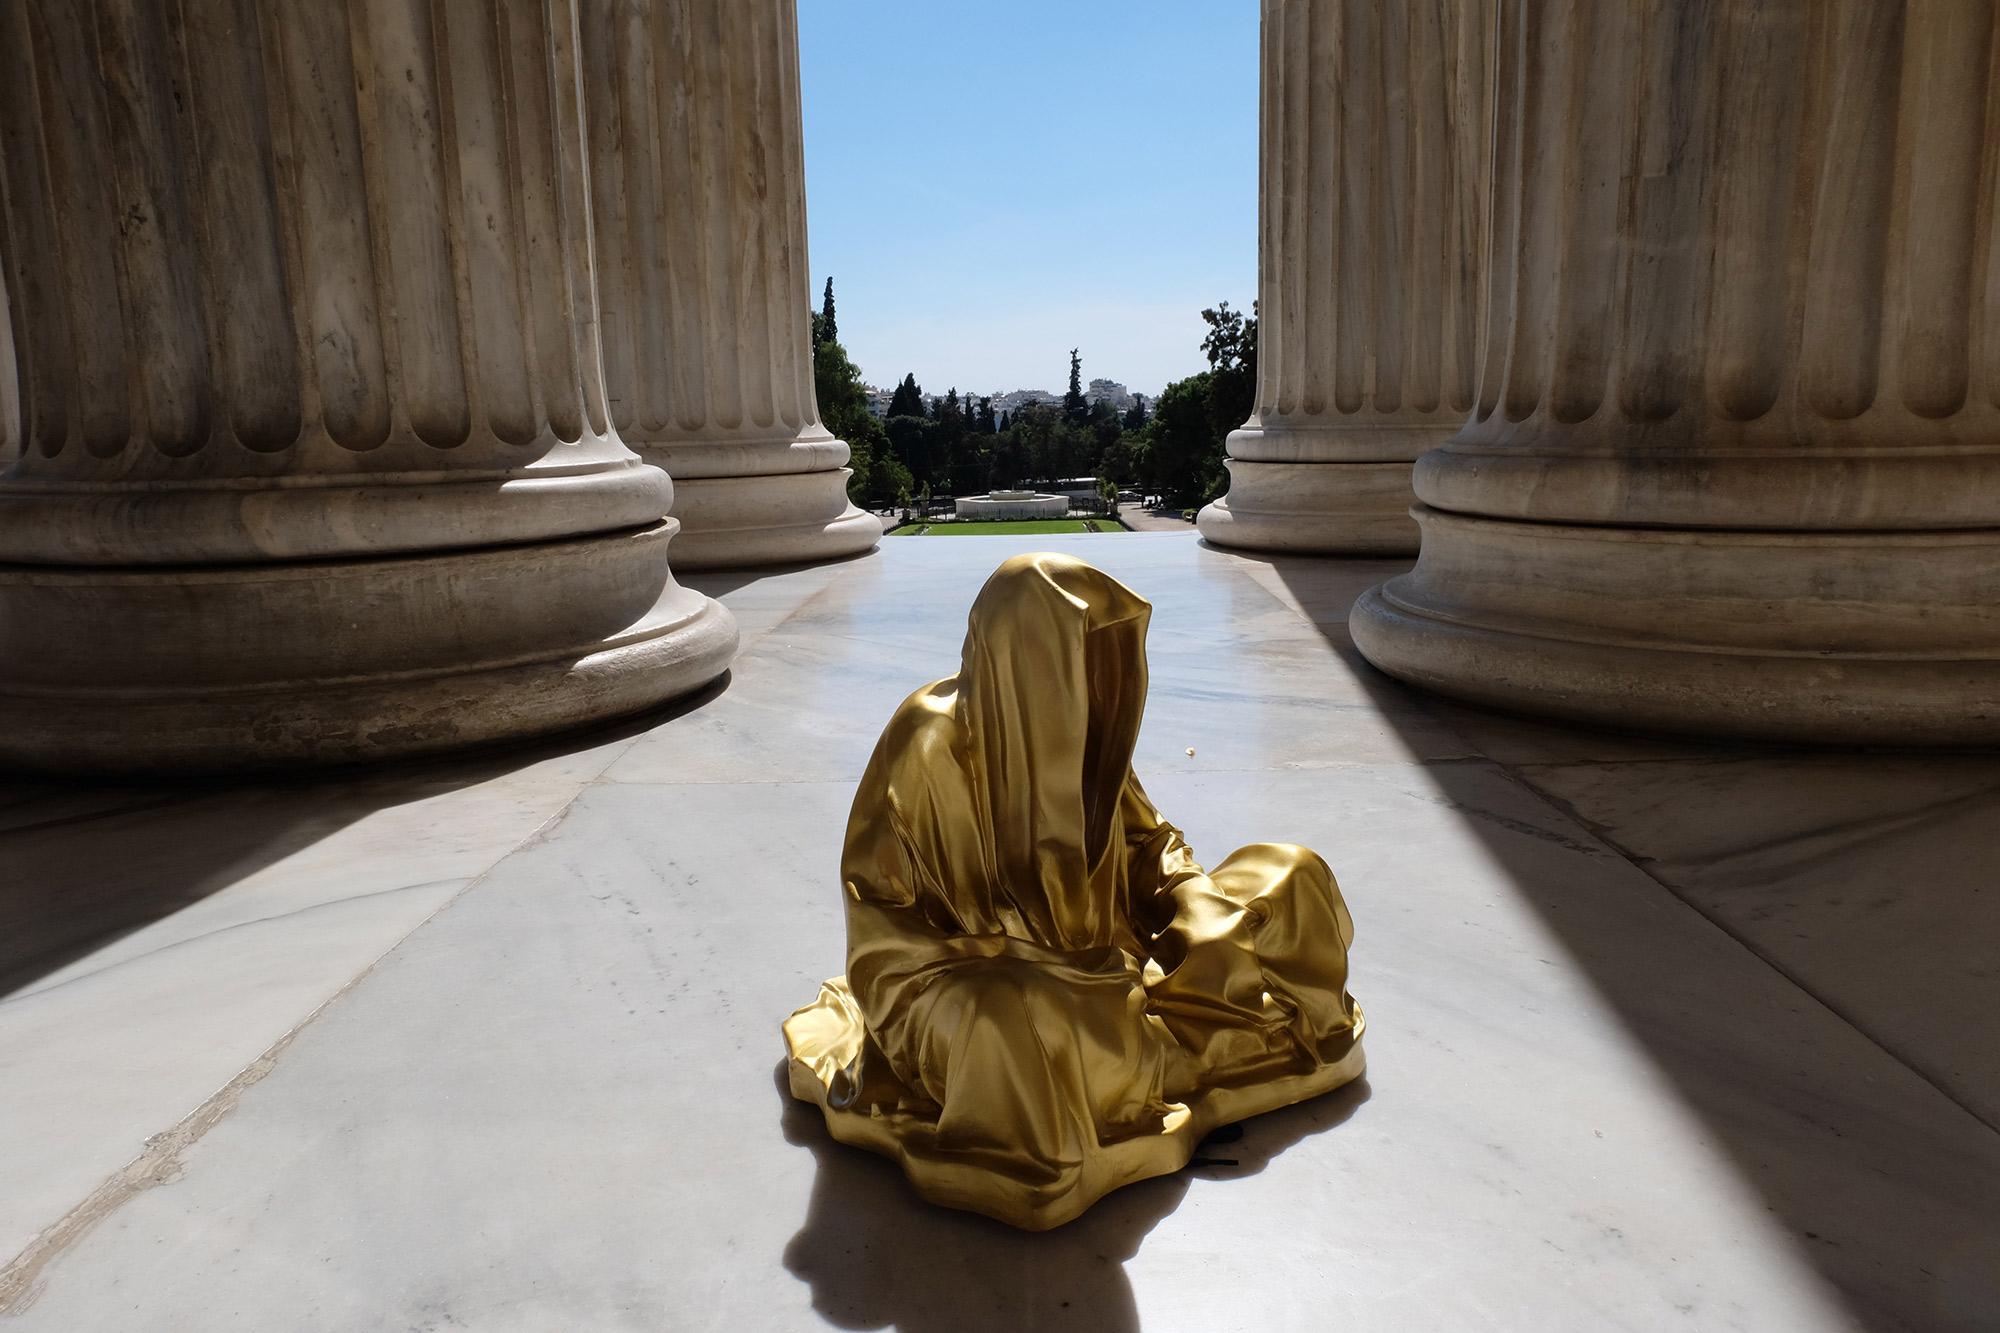 athens-acropolis-guardians-of-time-manfred-kili-kielnhofer-stone-marble-plastic-statue-sculpture-modern-art-fine-arts-arte-gallery-museum-show-8584